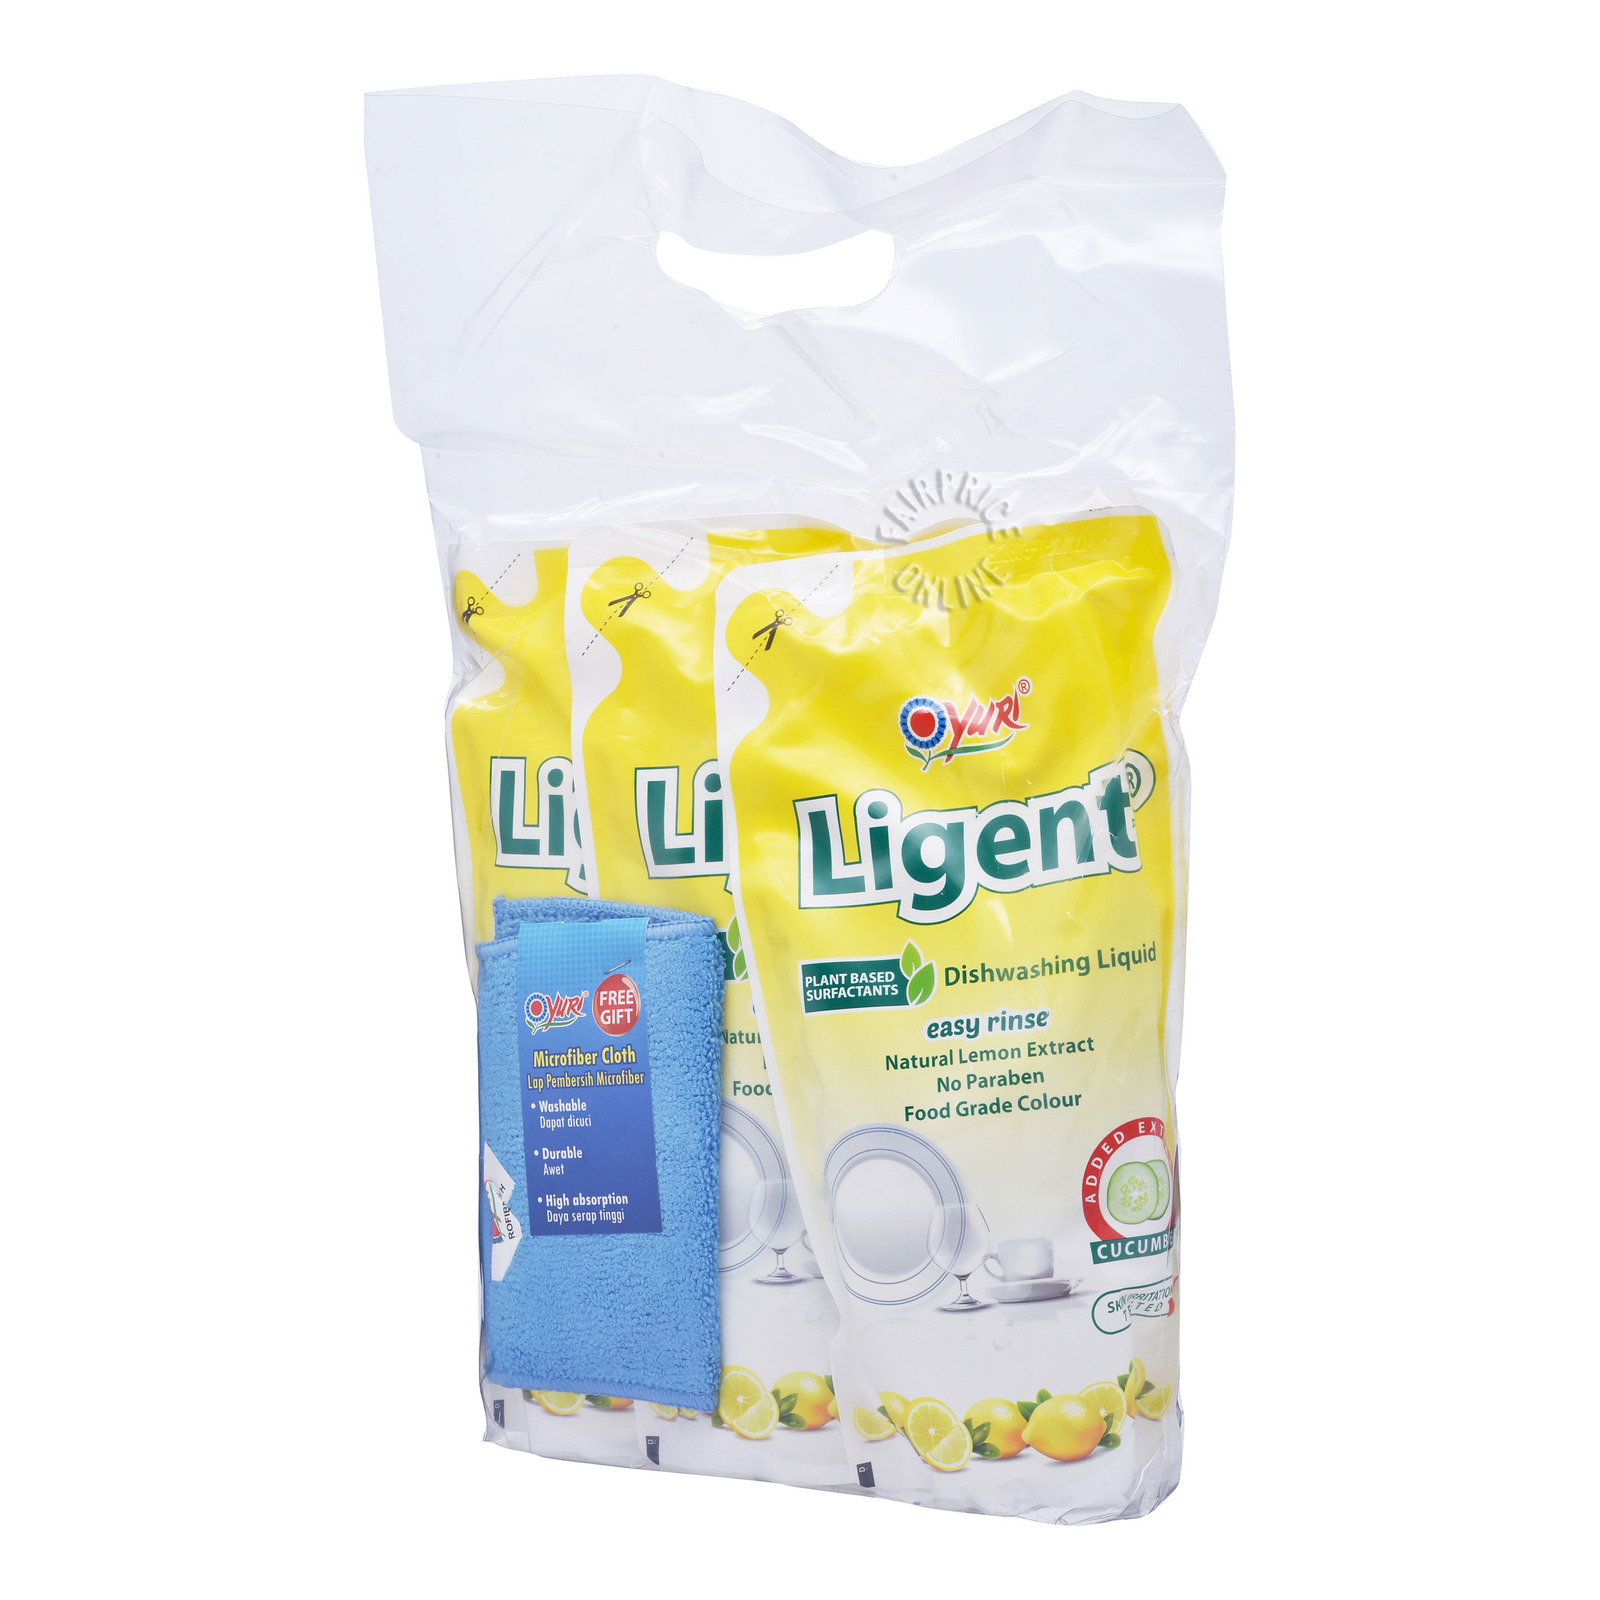 Yuri Ligent Dishwashing Detergent Refill - Lemon